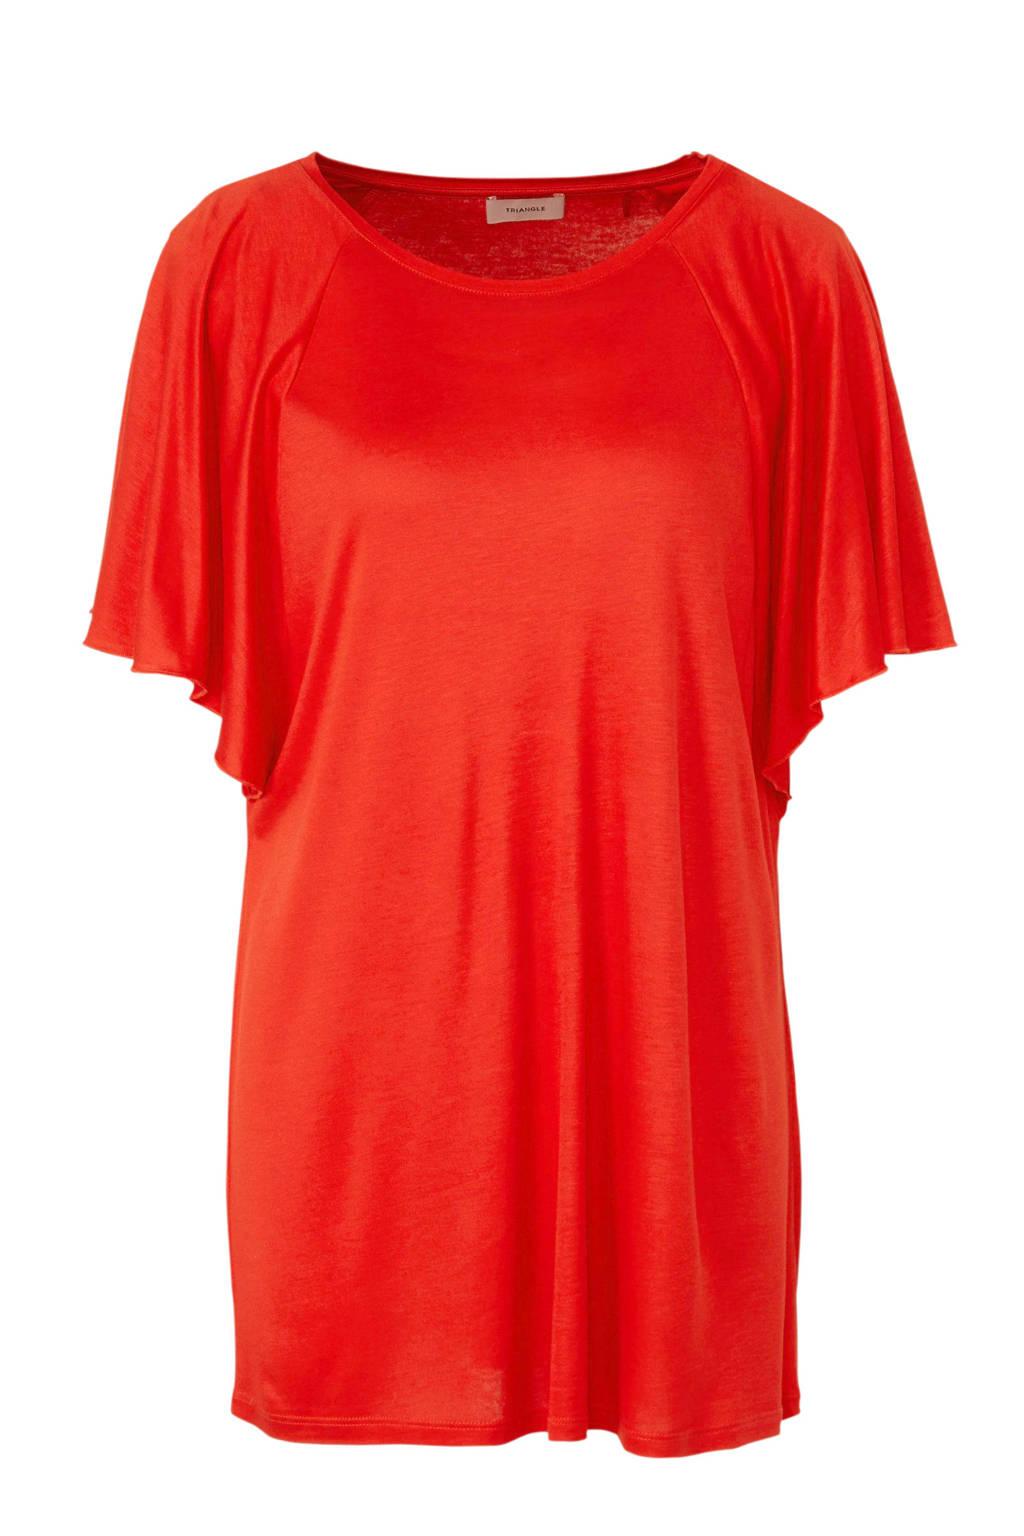 TRIANGLE T-shirt rood, Rood